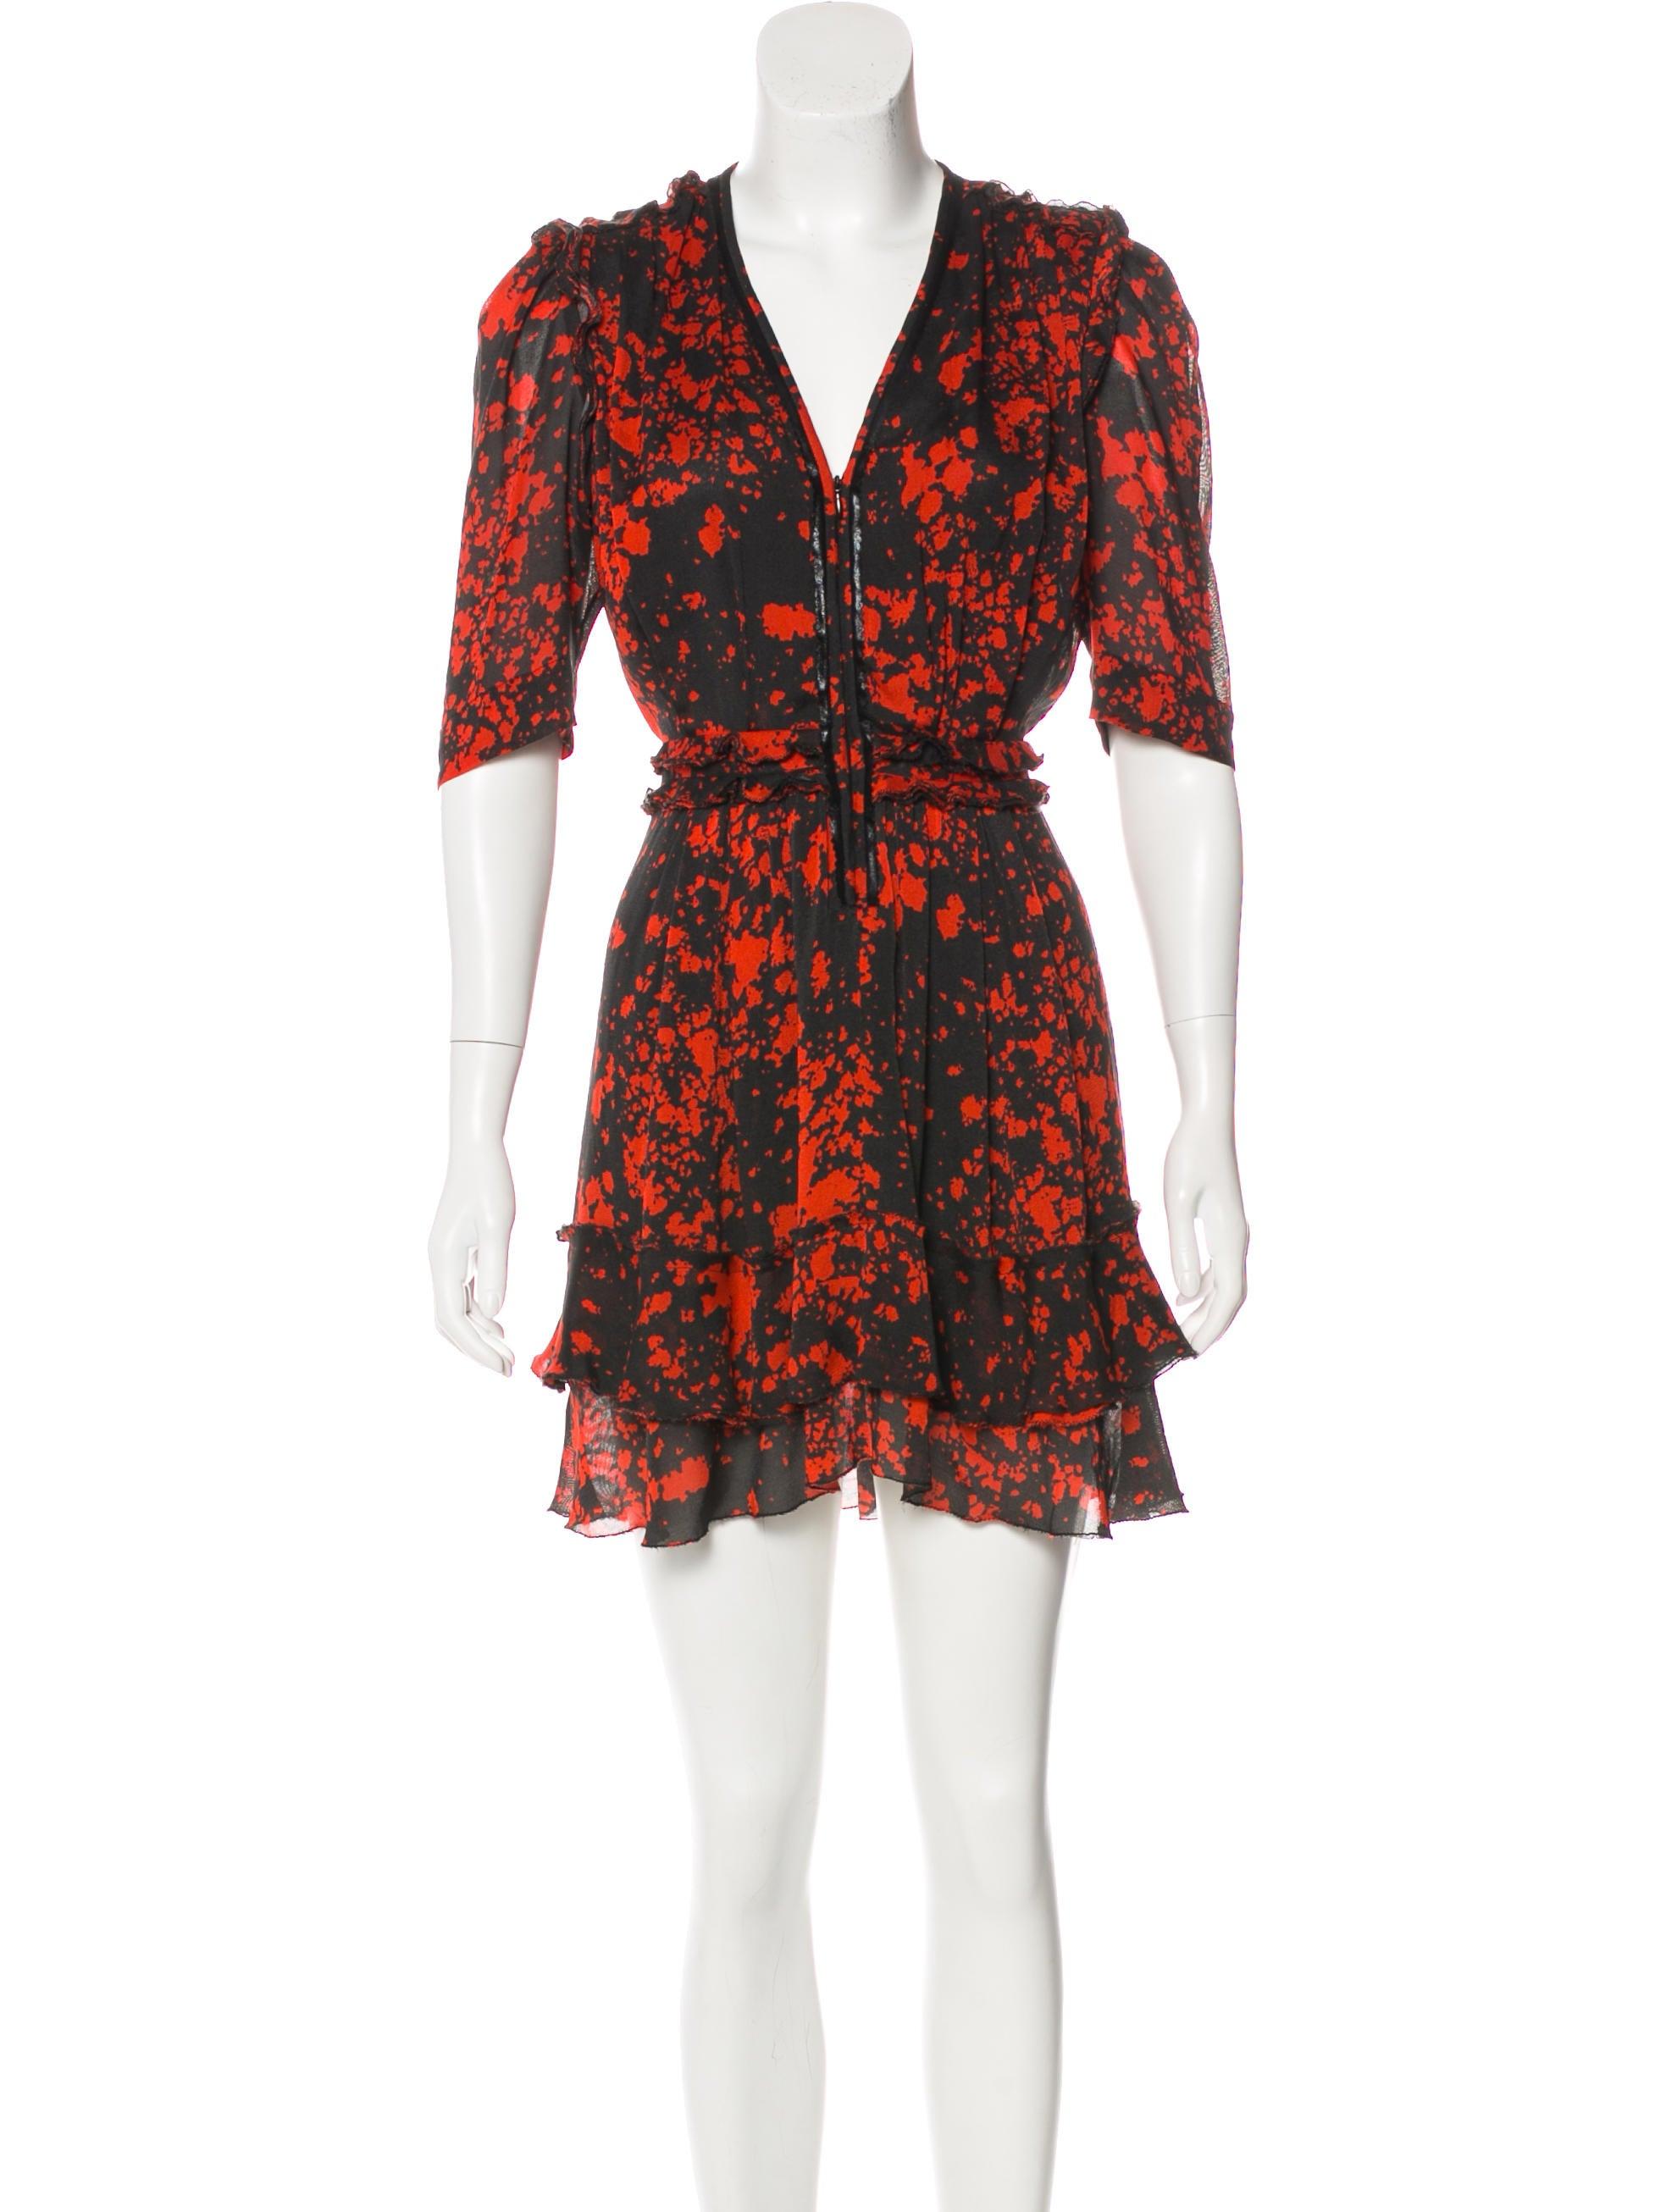 Isabel marant silk leather trimmed dress clothing for Isabel marant shirt dress